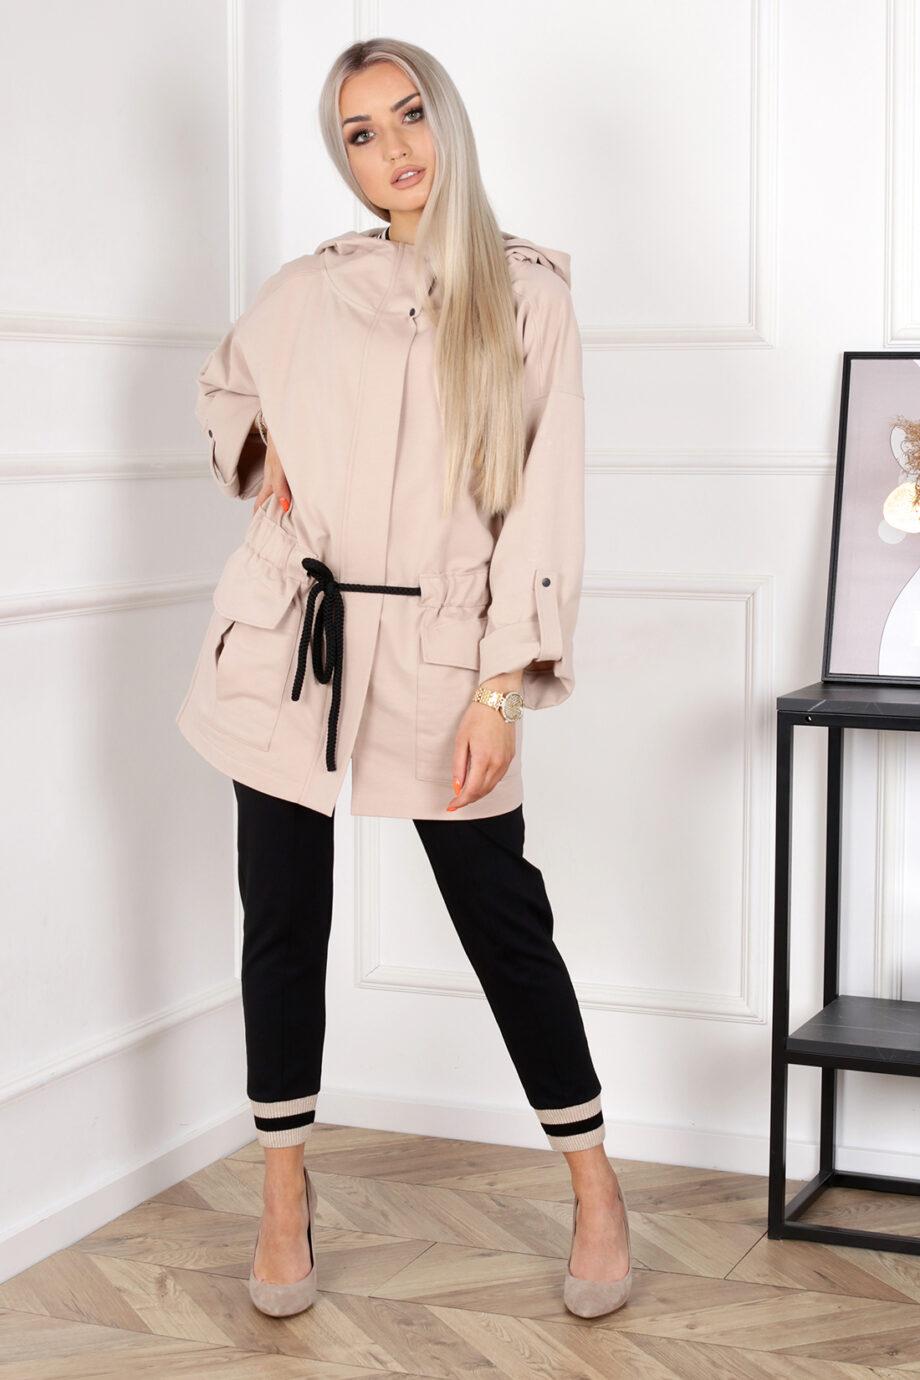 https://alekssandra.pl/wp-content/uploads/2021/03/FLORANCE-bluza-i-SELENA-spodnie-1.jpg